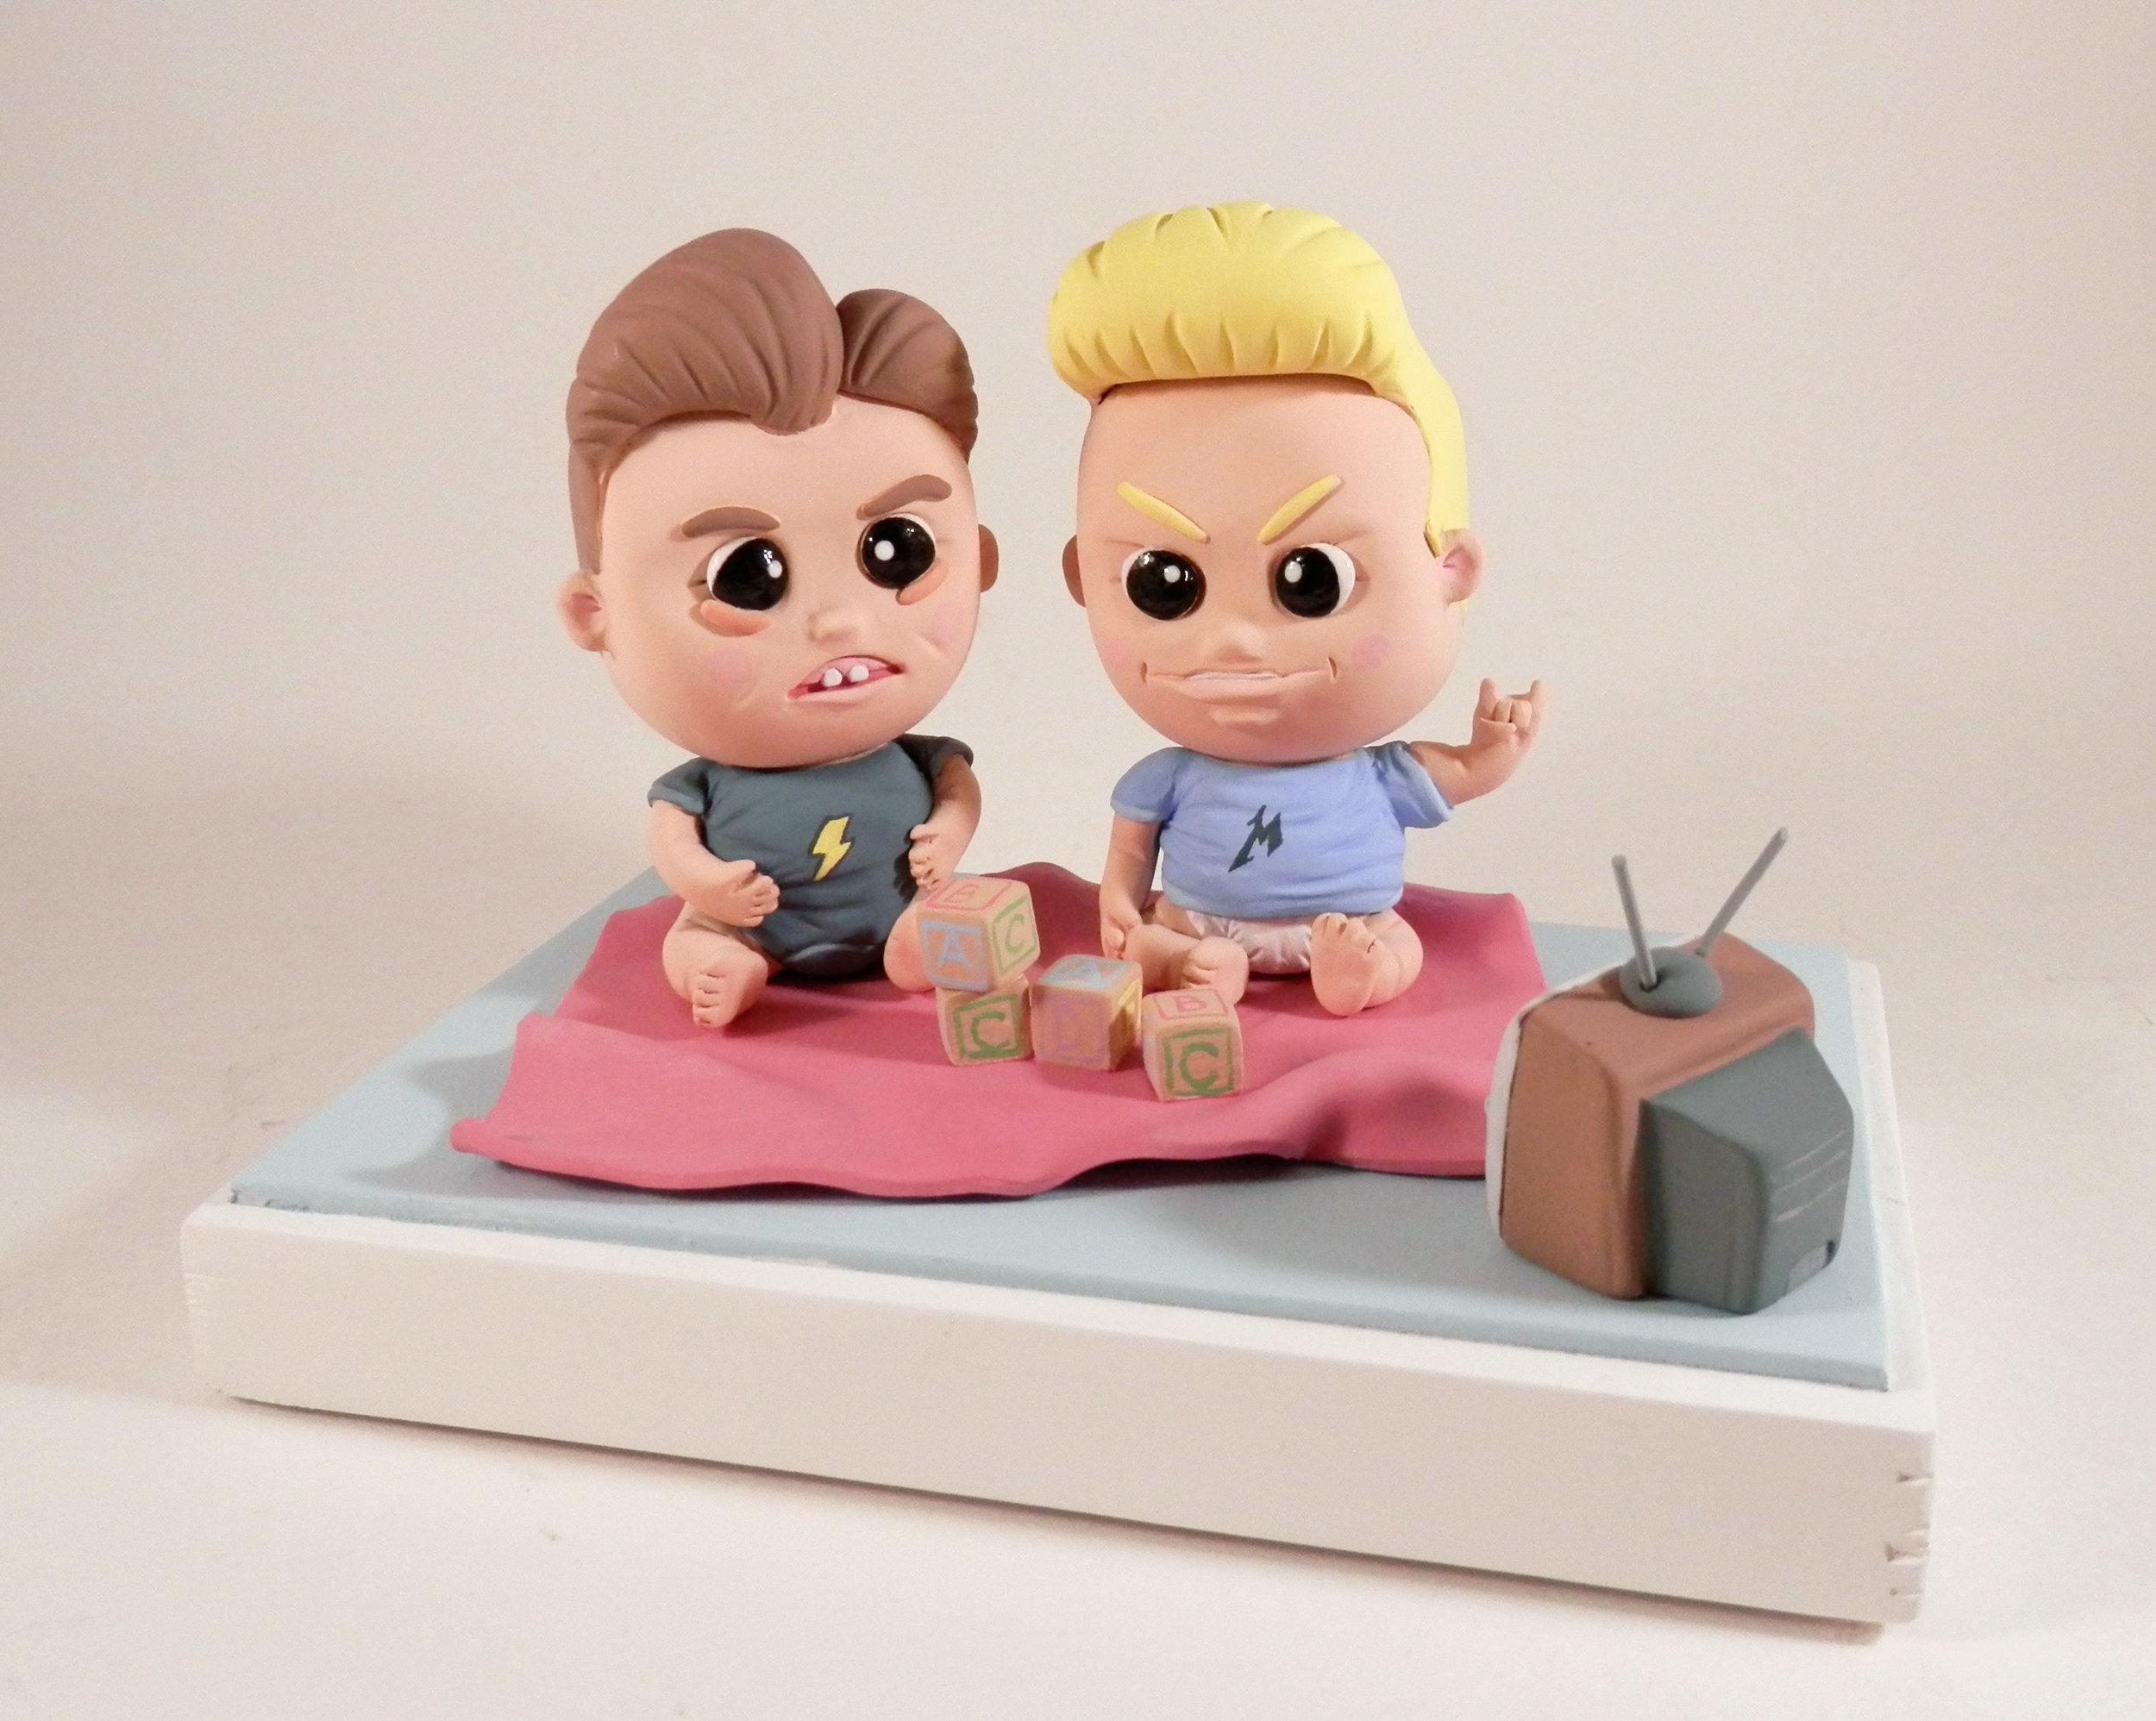 Butthead Babies